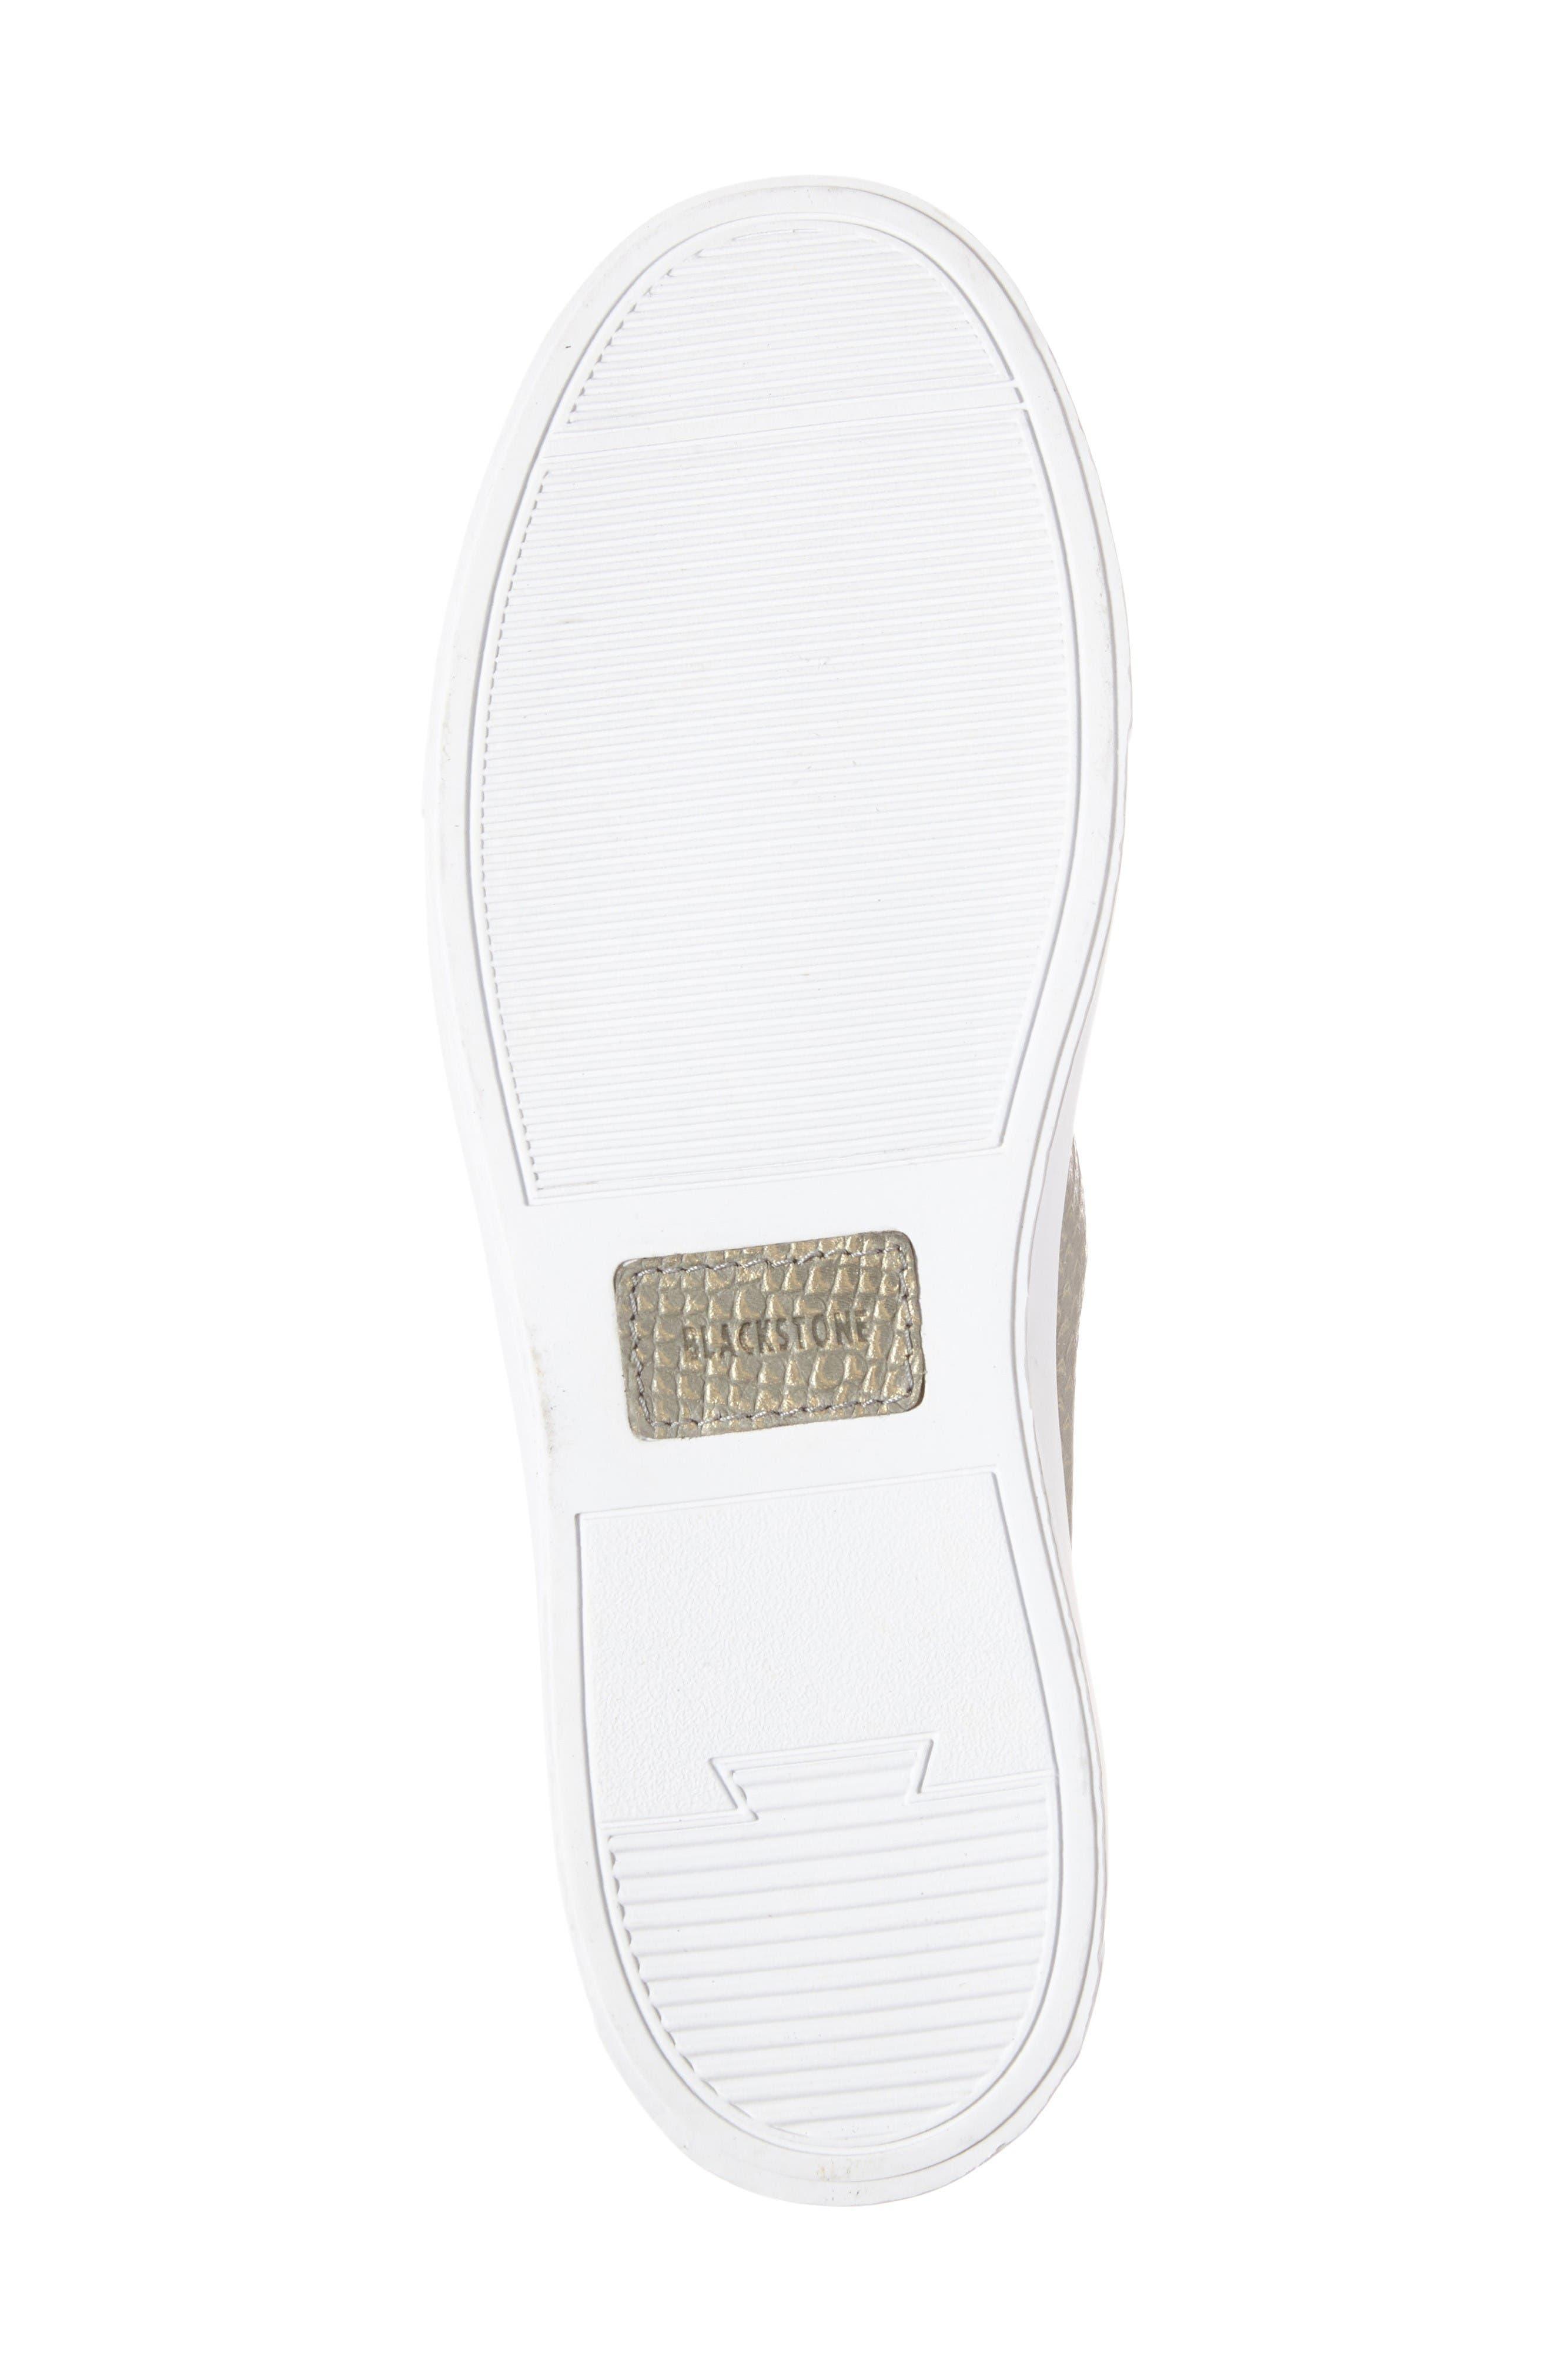 NL28 Midi Sneaker,                             Alternate thumbnail 4, color,                             Grey Nubuck